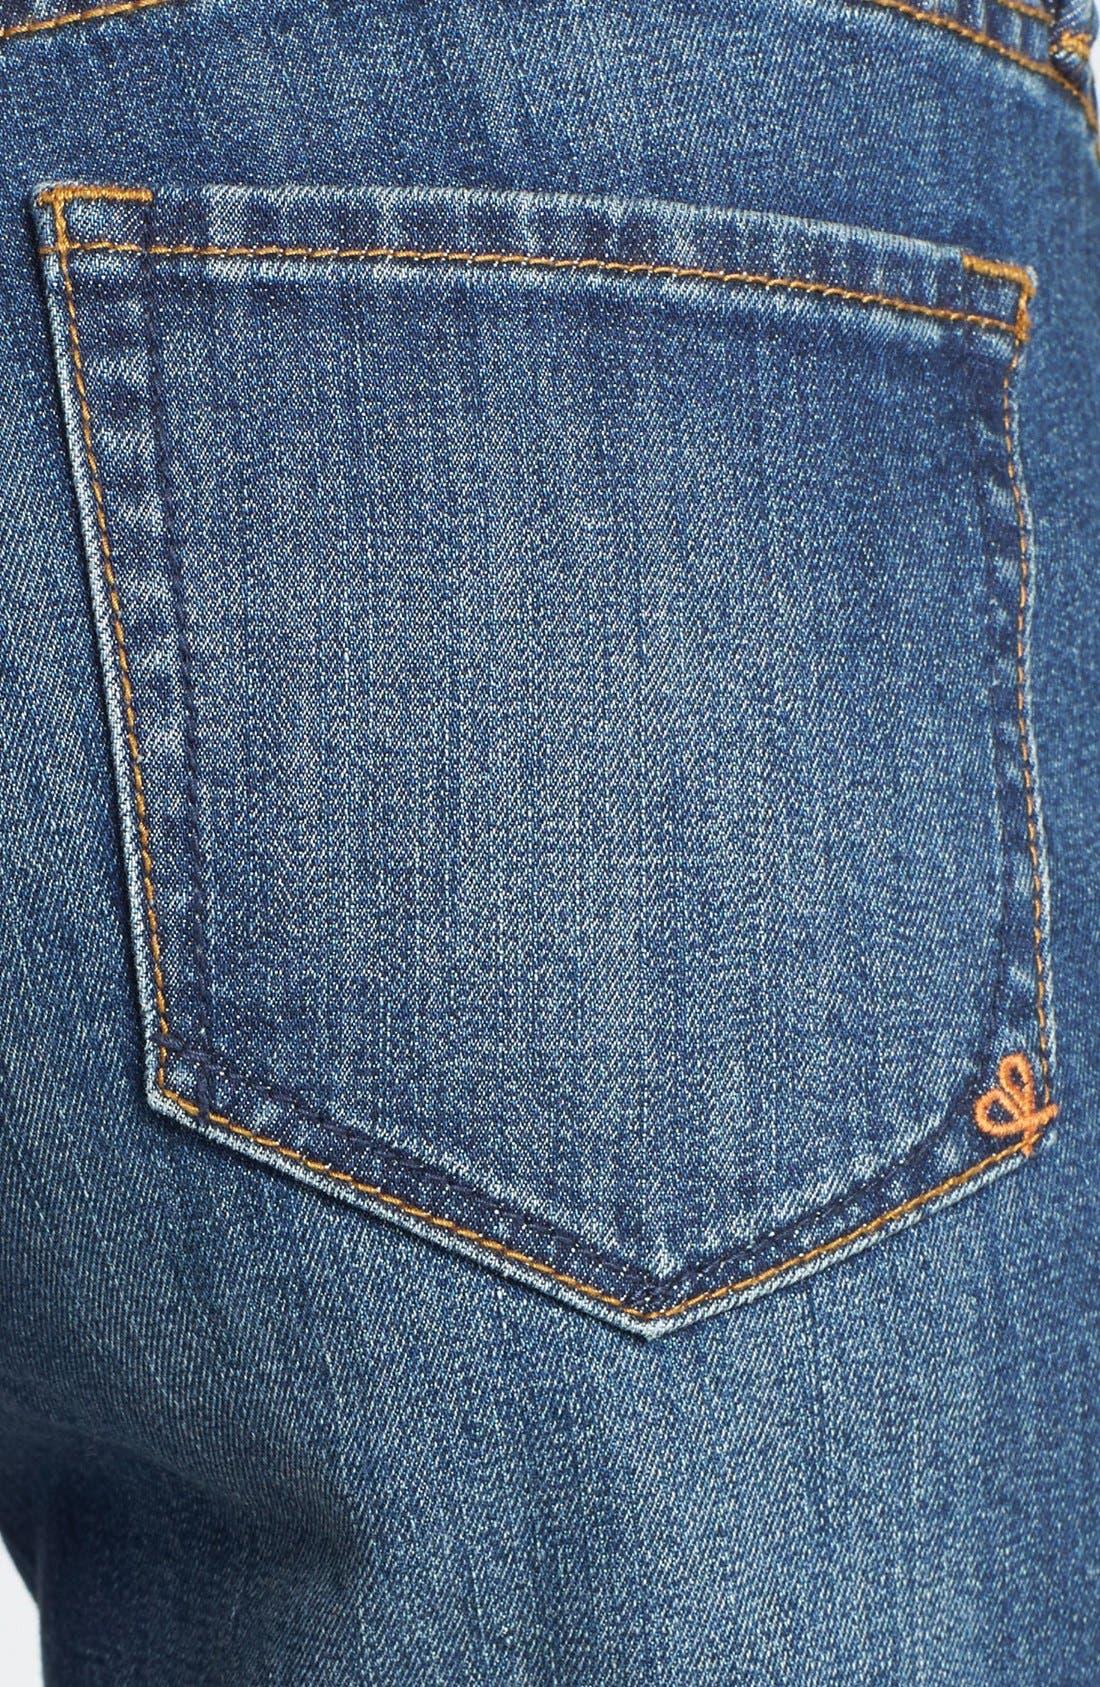 Alternate Image 3  - Dittos 'Charlie' Destroyed Boyfriend Jeans (Lady Foot)